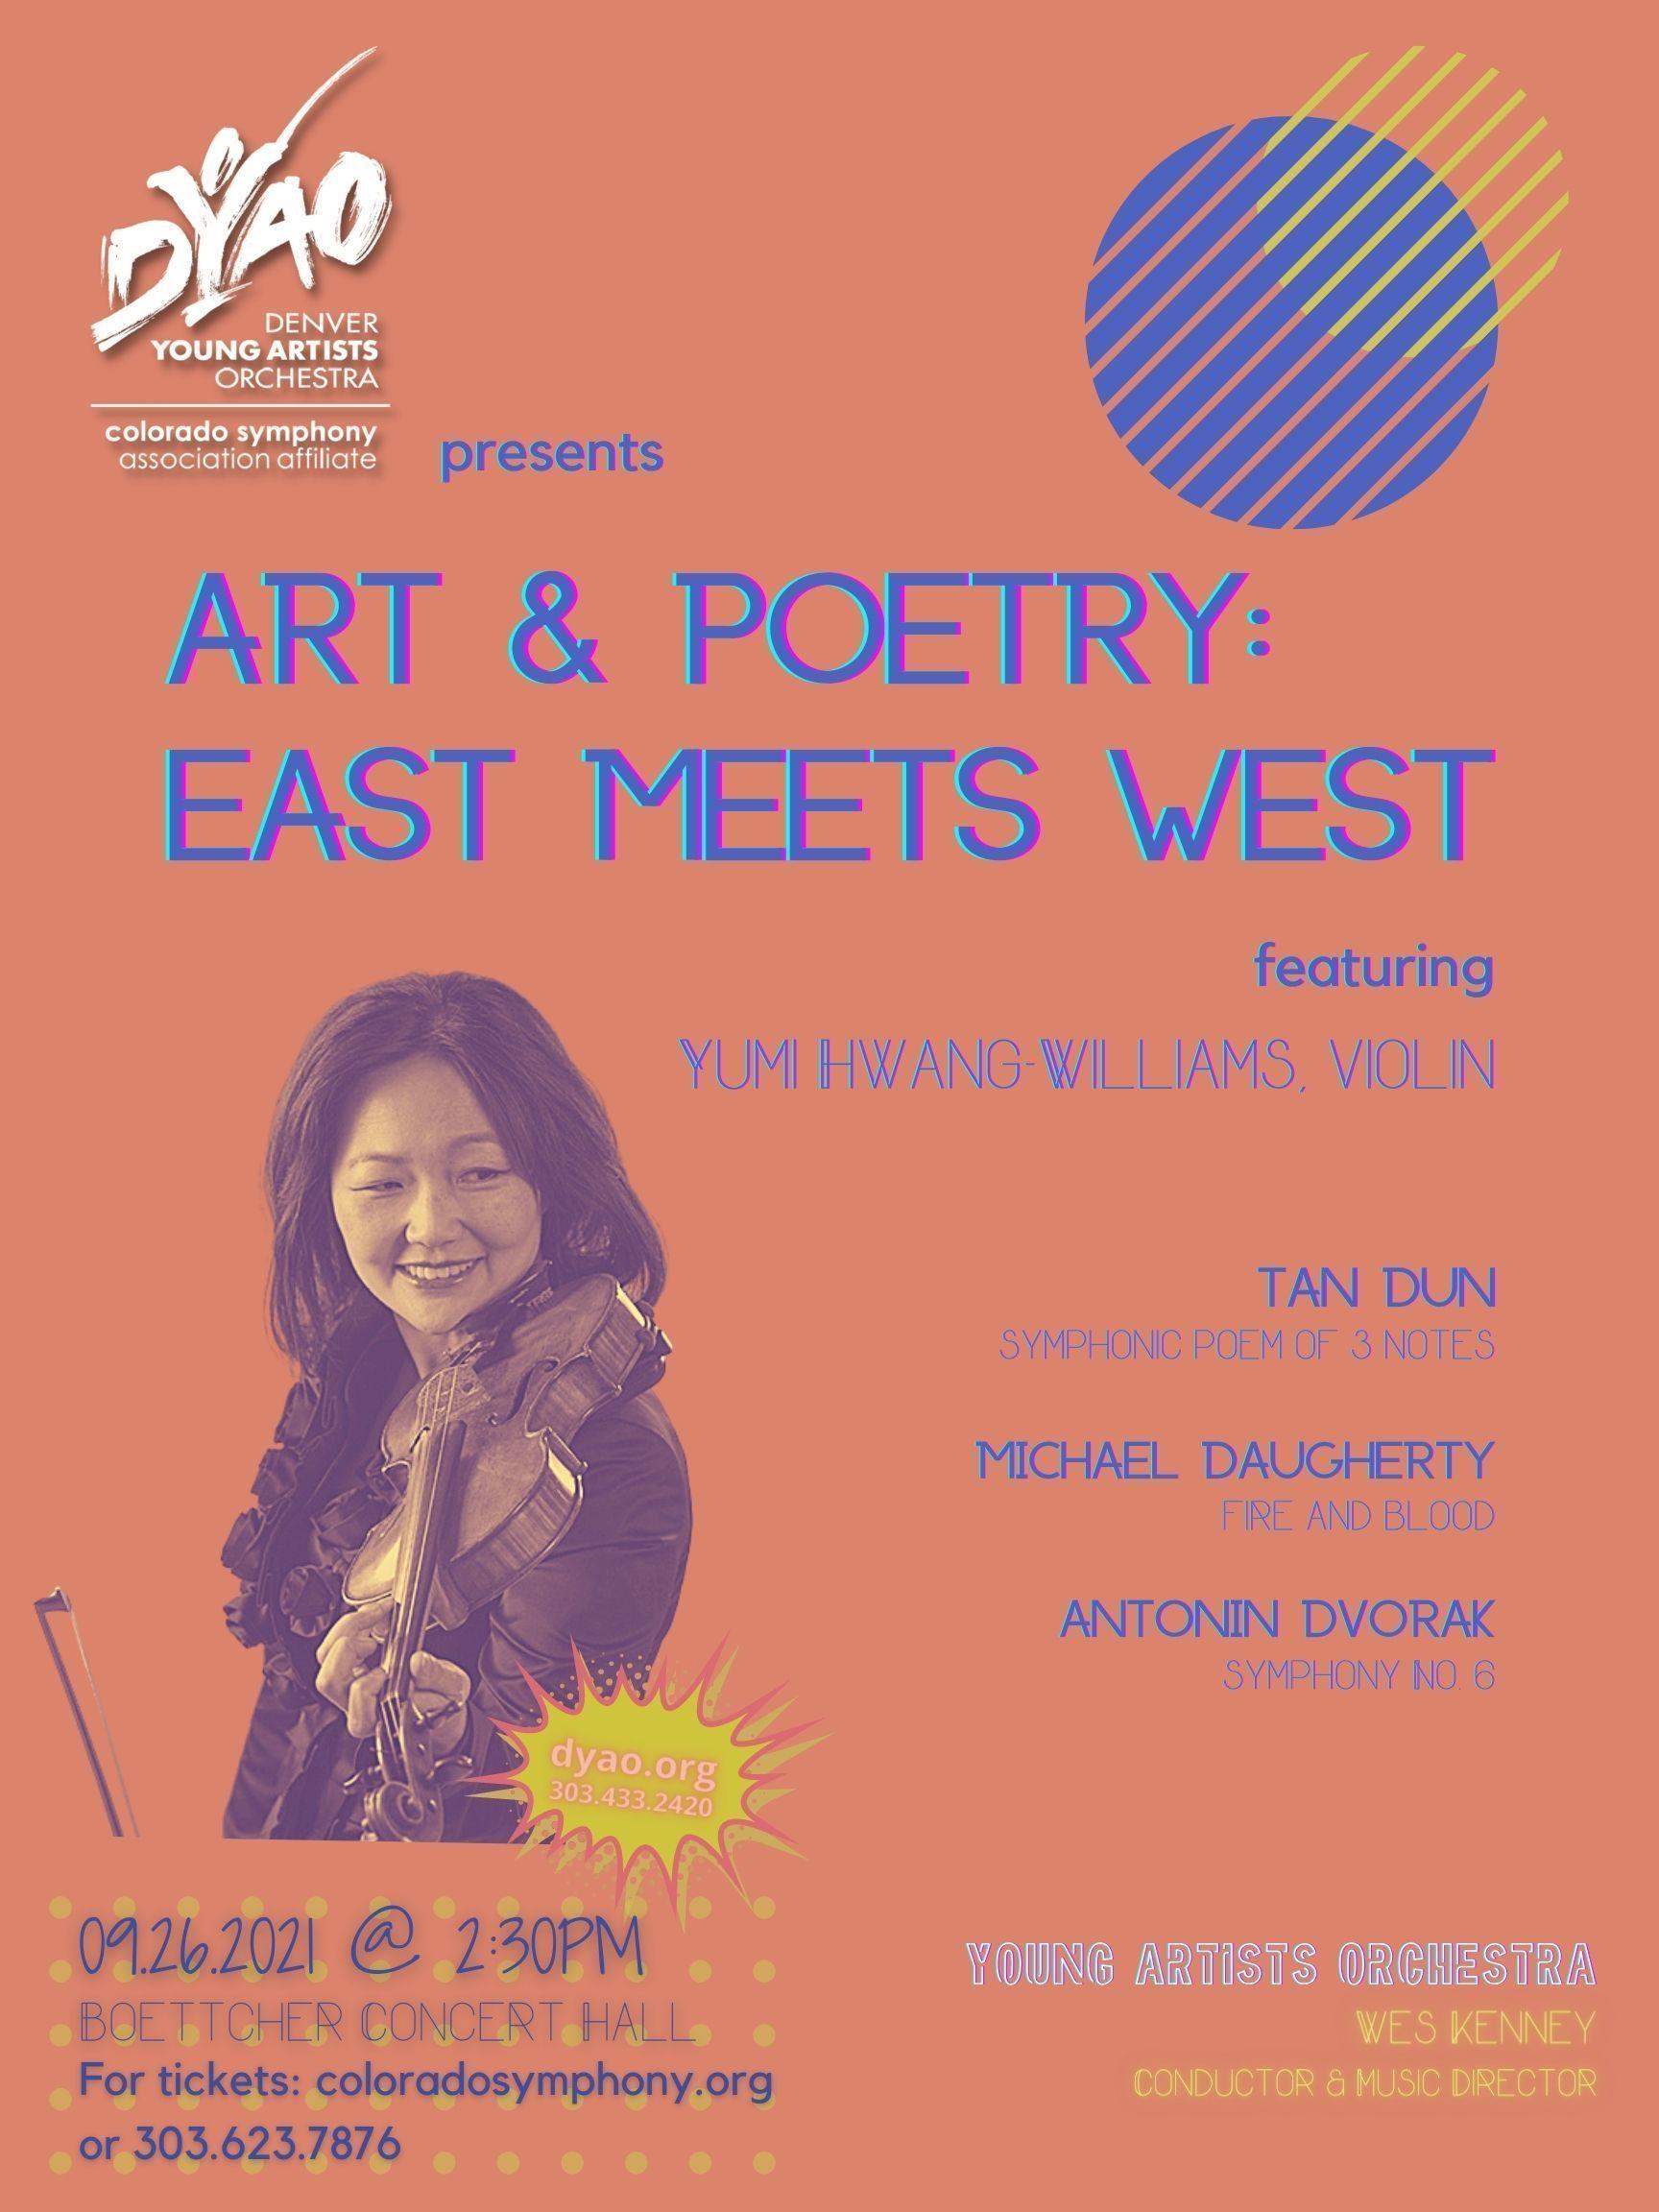 DYAO presents Art & Poetry: East Meets West